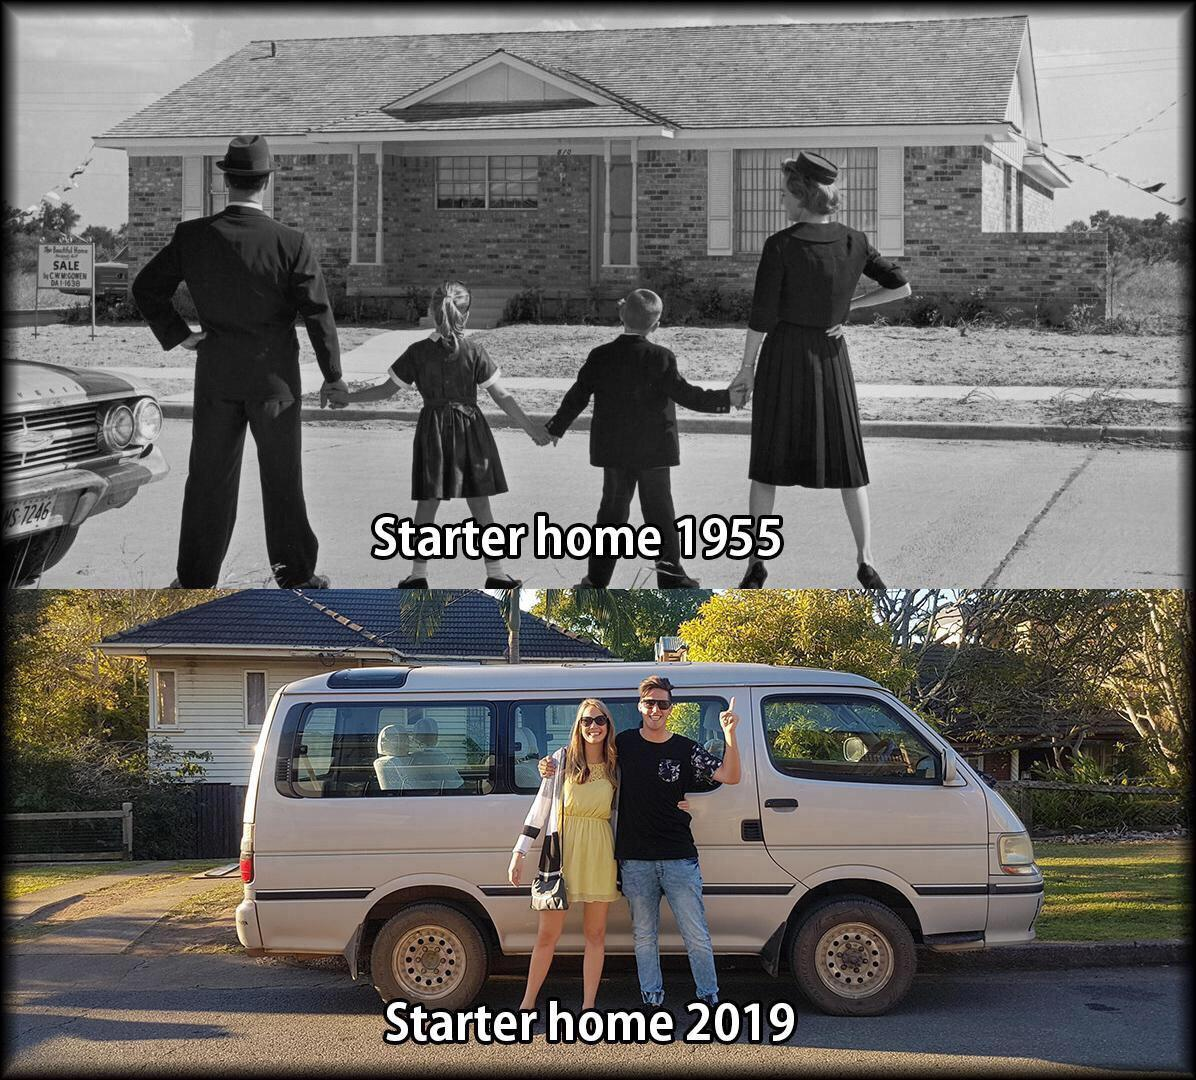 Primer hogar antes vs ahora